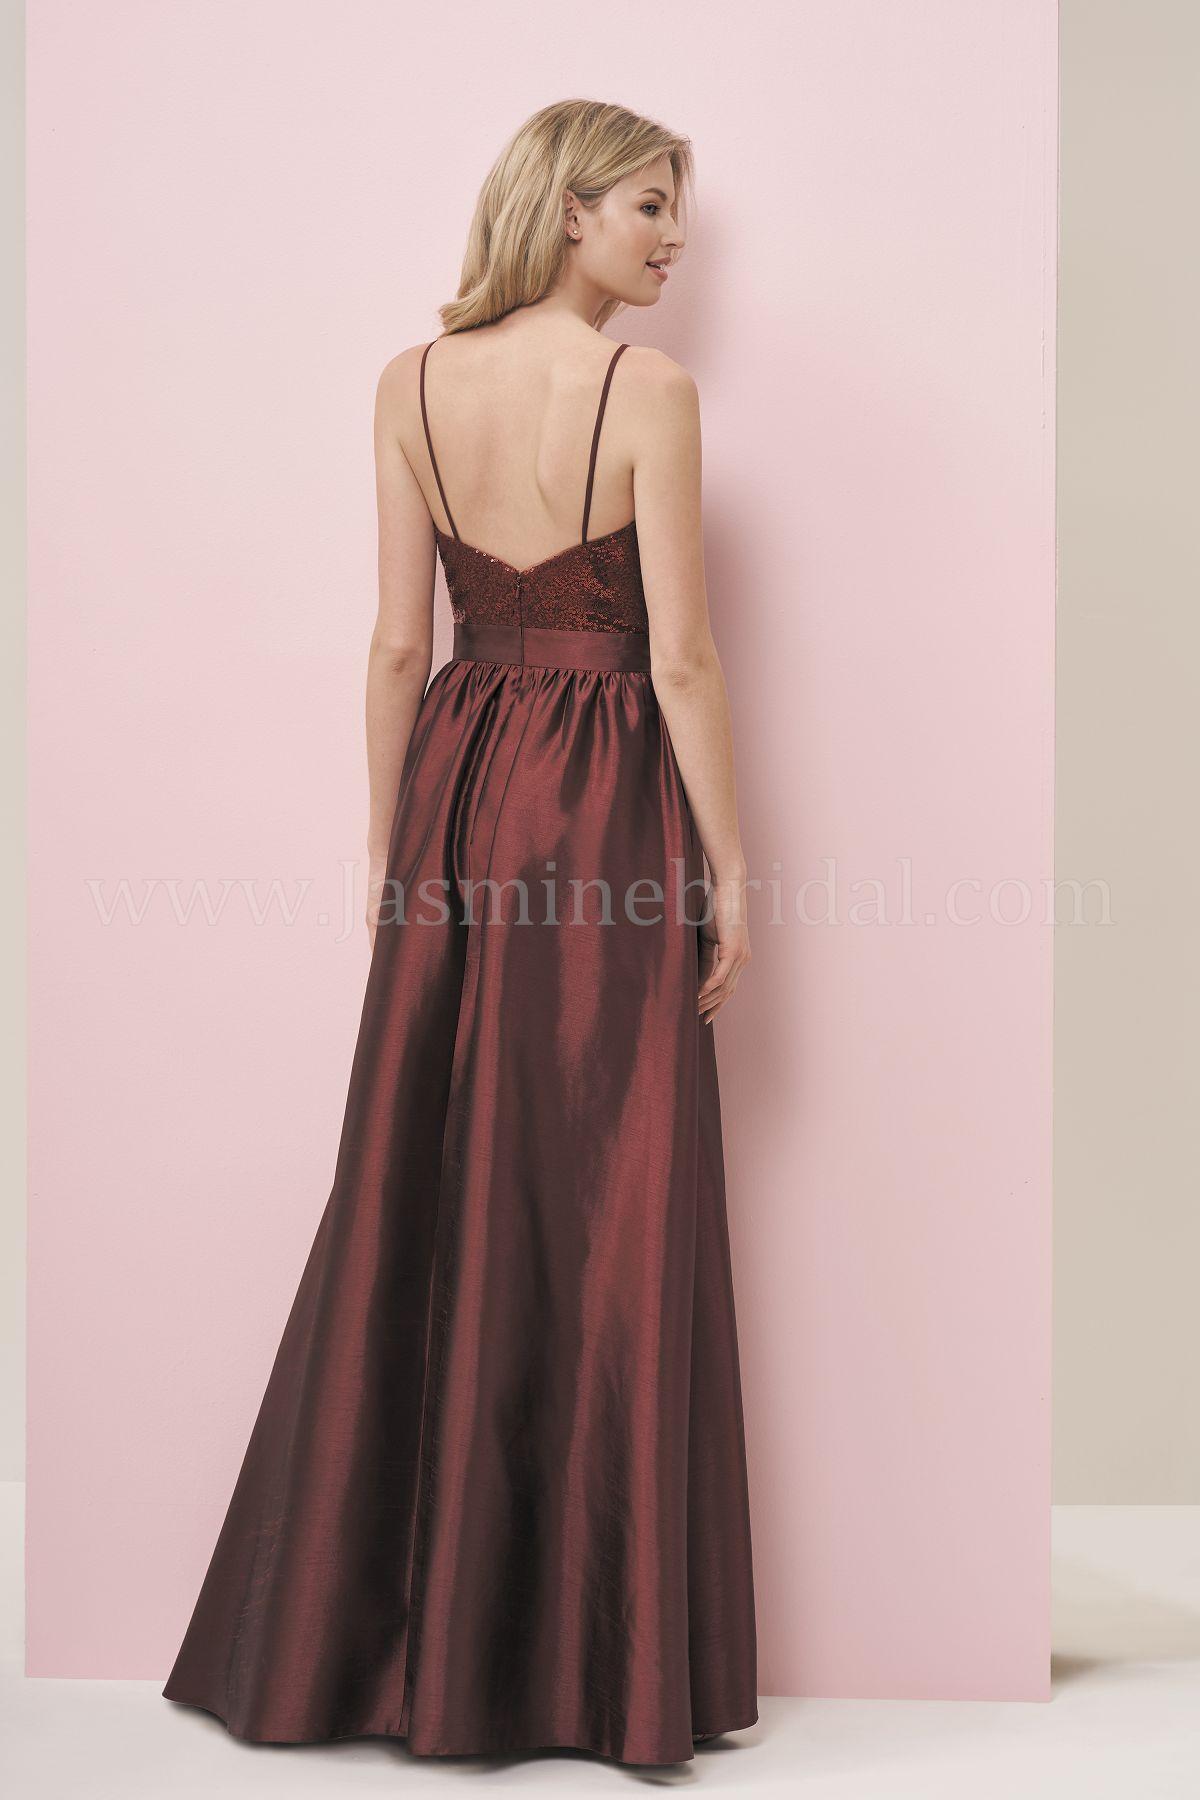 bridesmaid-dresses-P196059-B